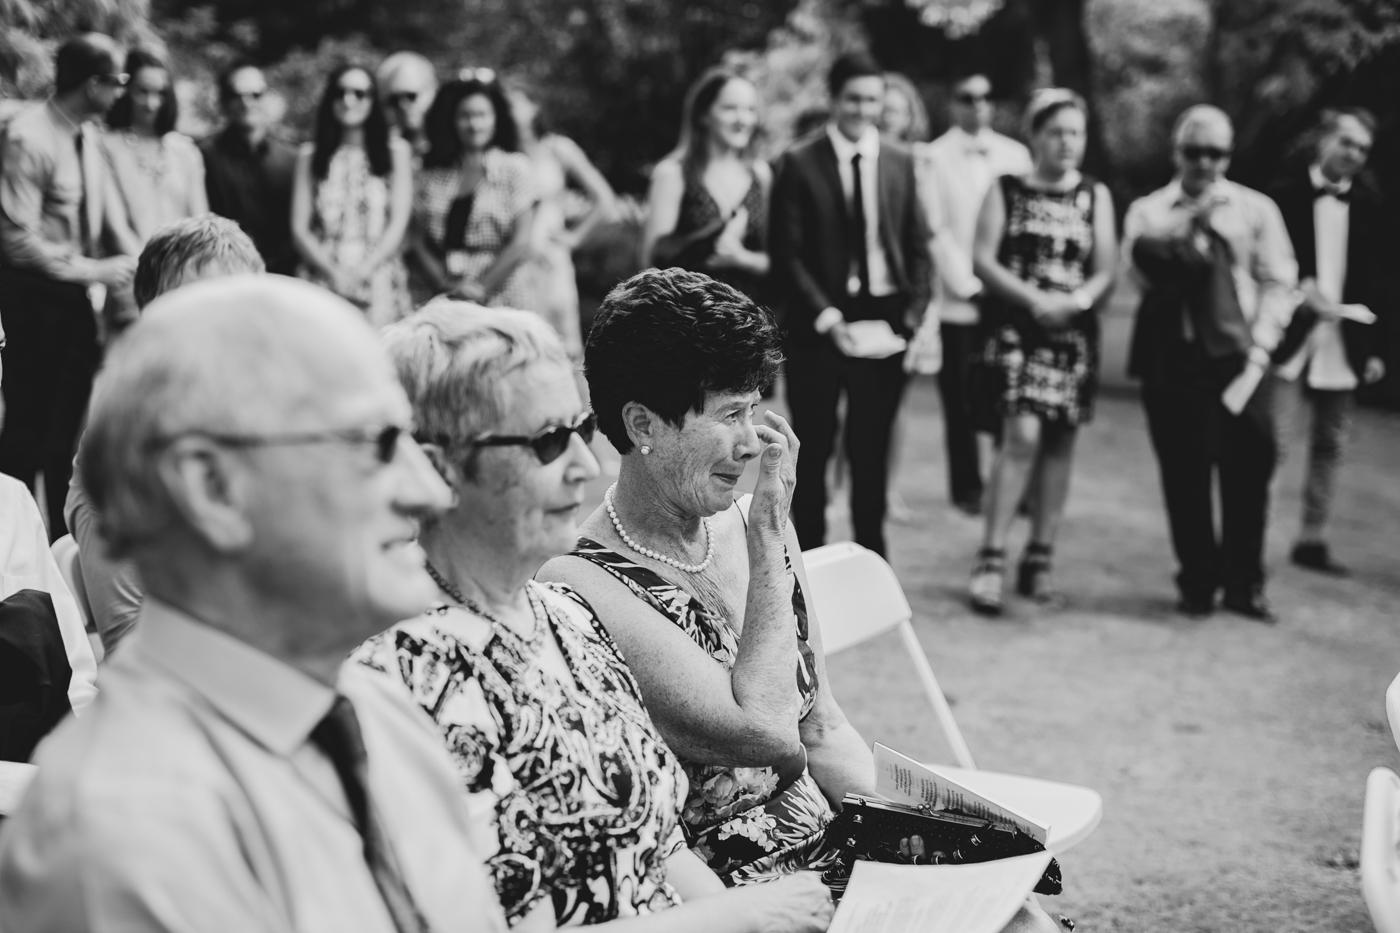 Ariana & Tim - Dunedin, New Zealand Wedding - Destination Wedding - Samantha Heather Photography-88.jpg